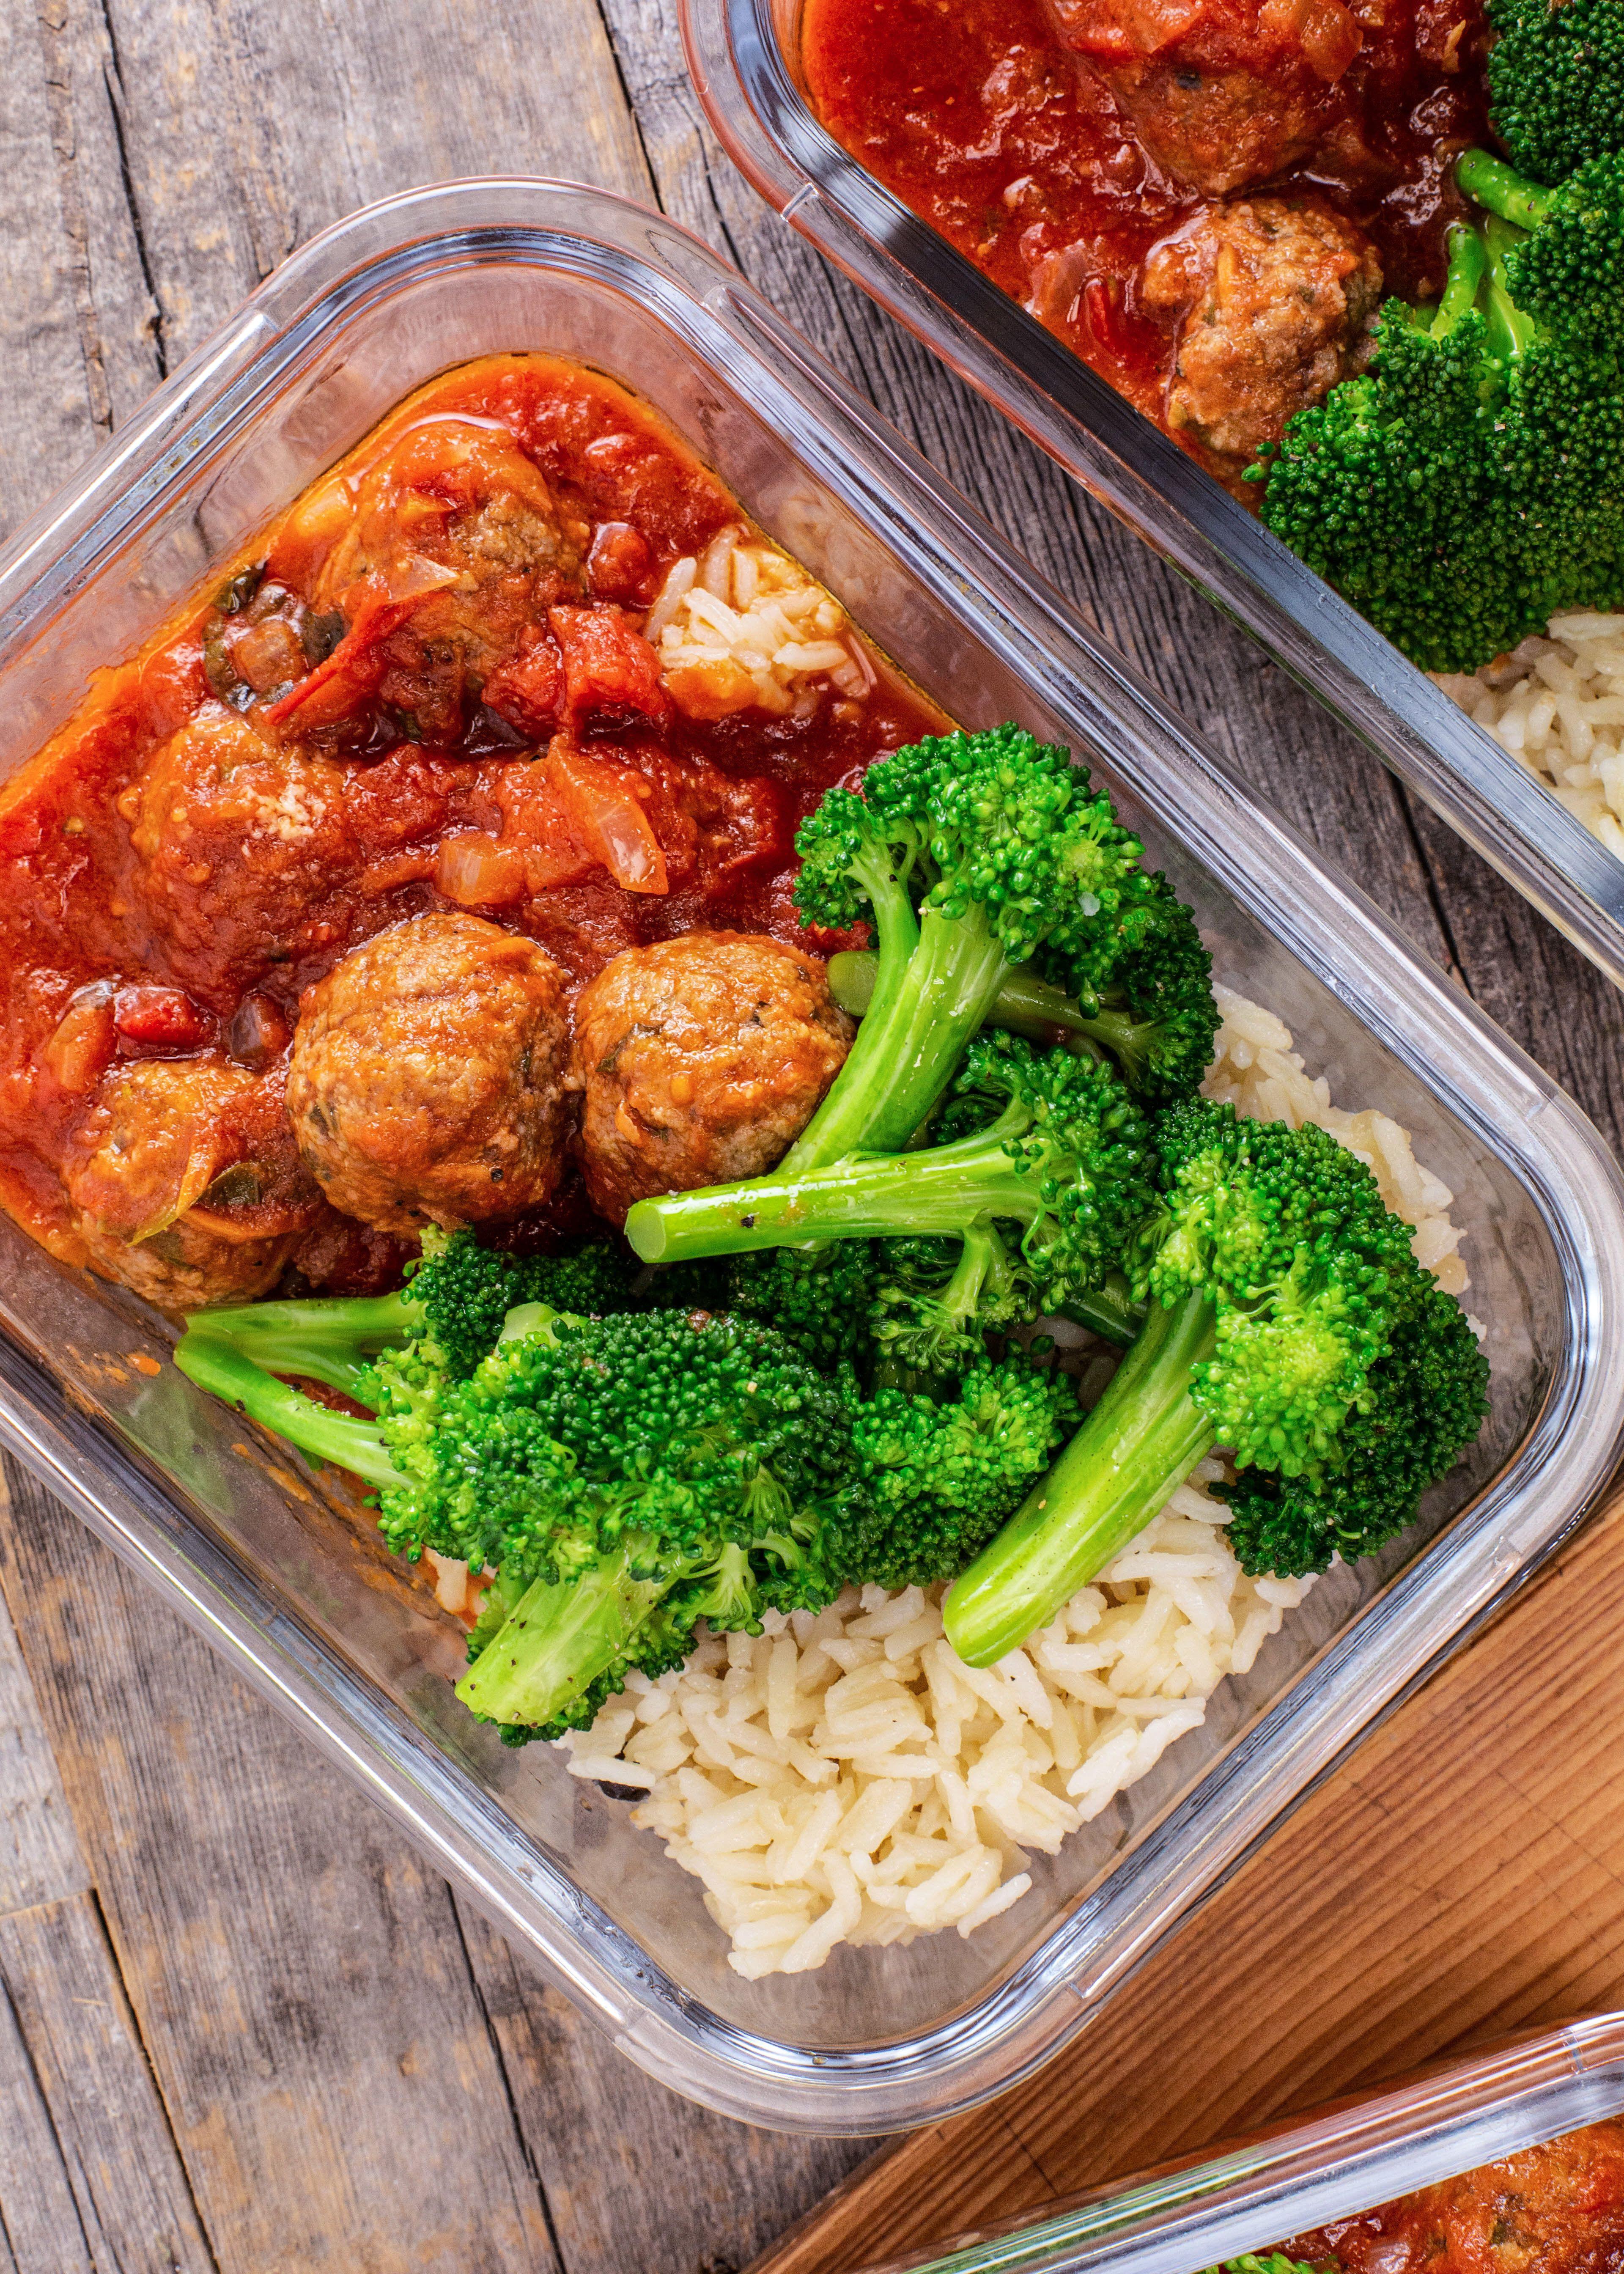 Make Ahead Meatball Meal Recipe Healthy Meal Prep Meals Food